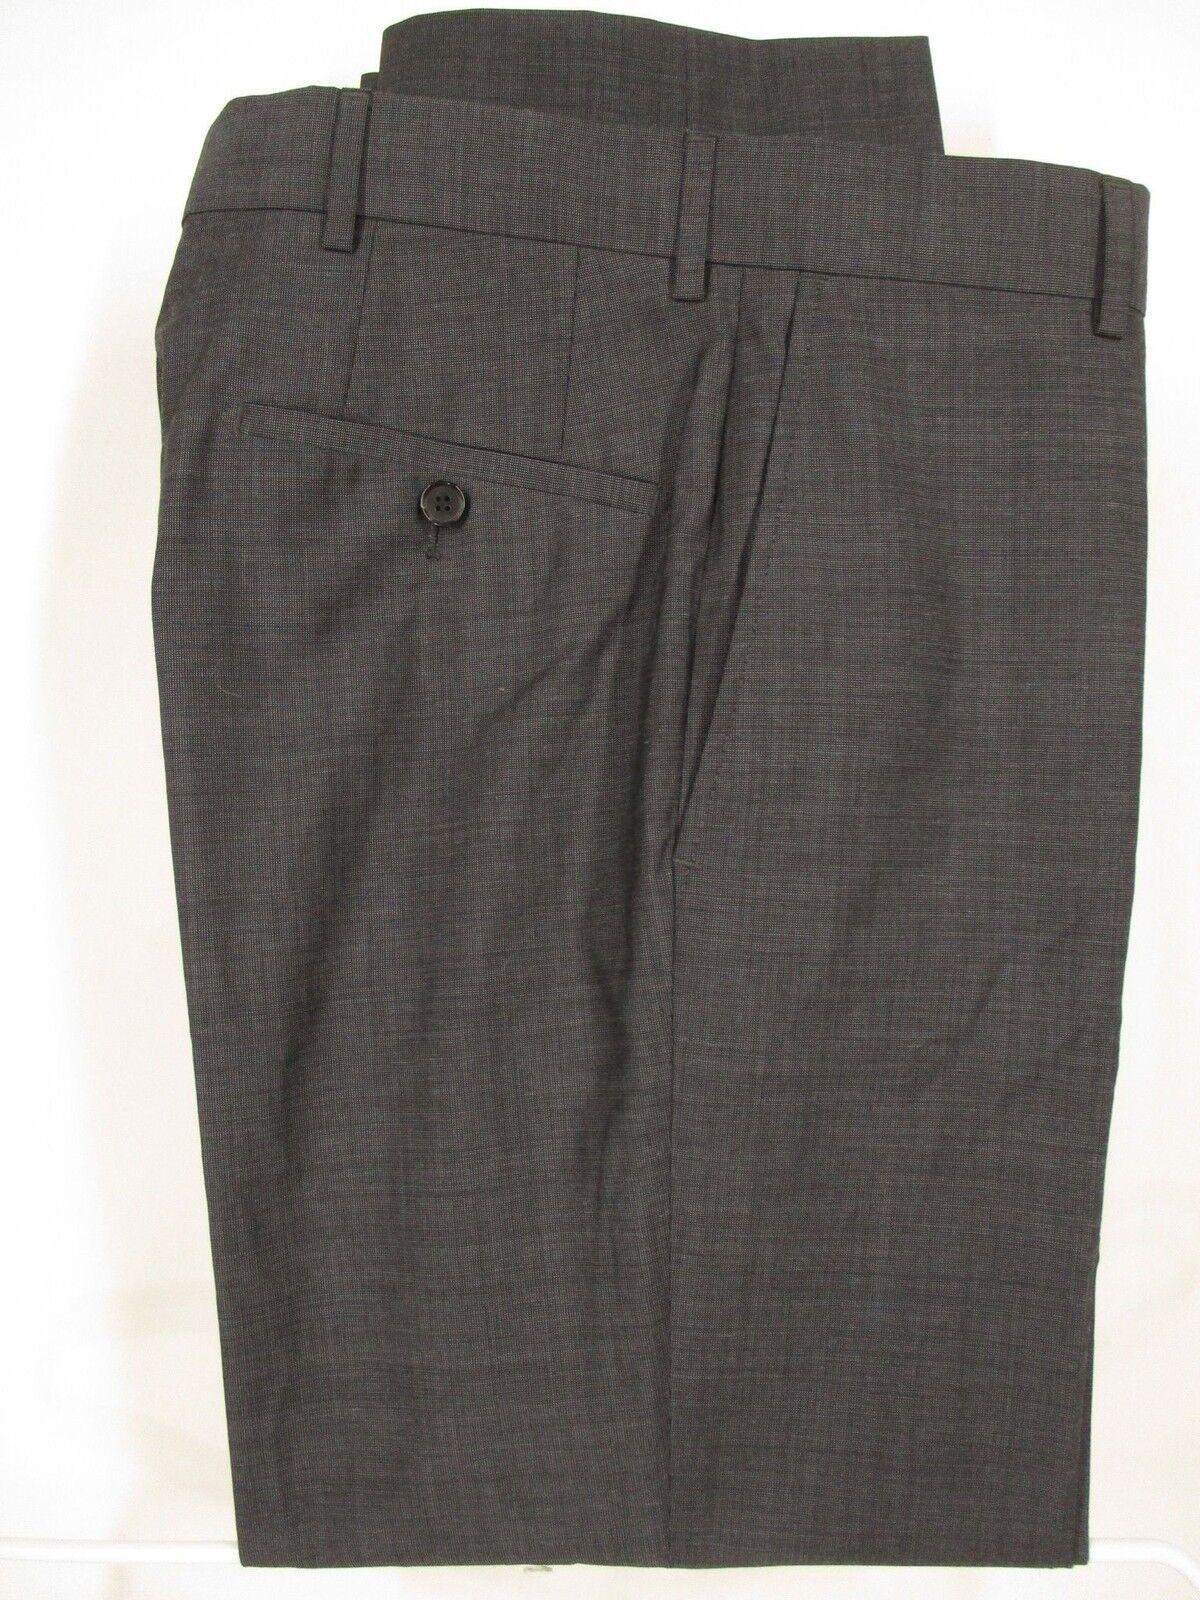 Hugo Boss Jeffrey Mens Grey Flat Front Wool Dress Pants 30R 32x29